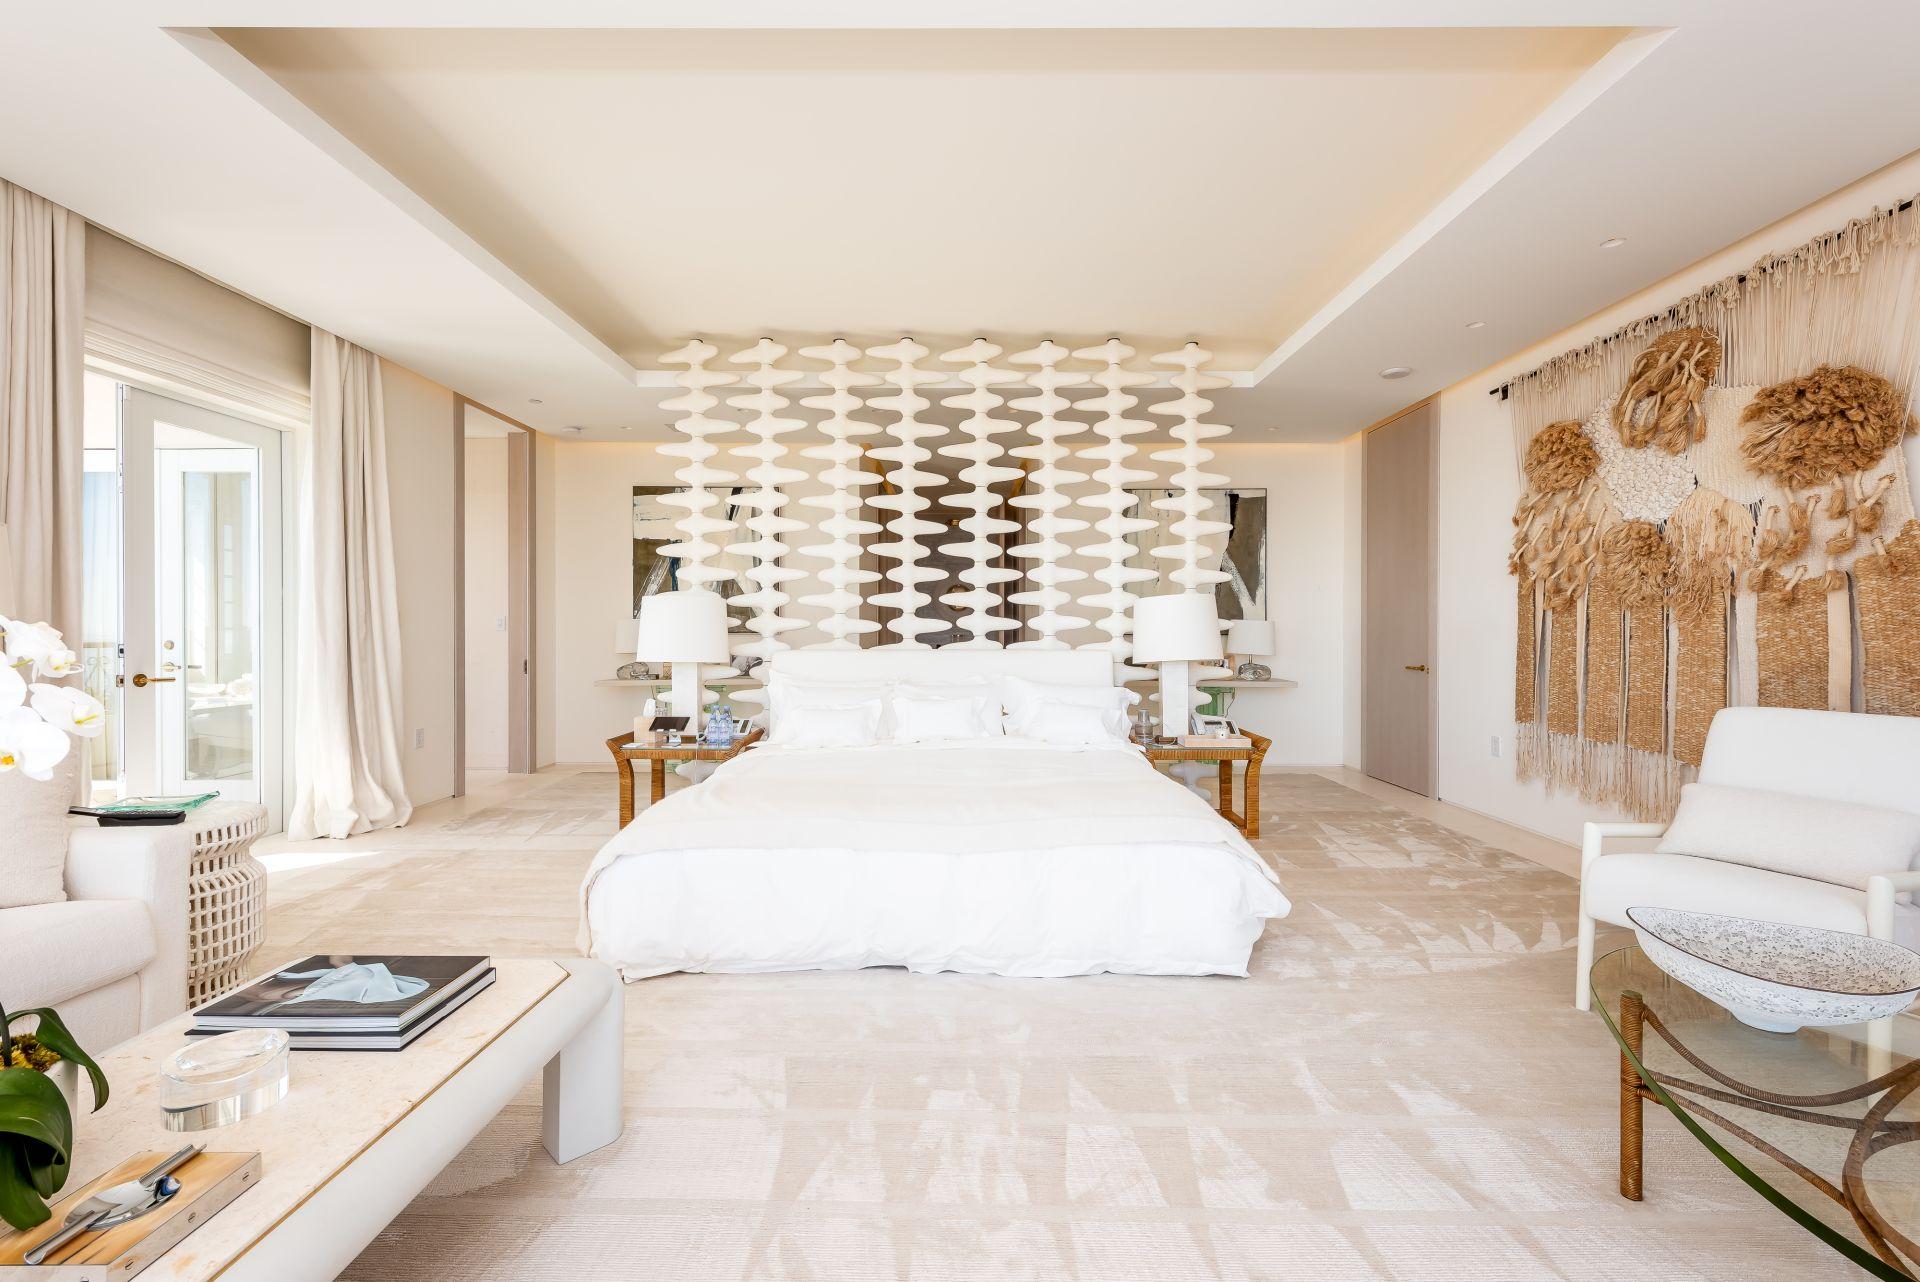 Oceanside PH7292 master bedroom with direct ocean views